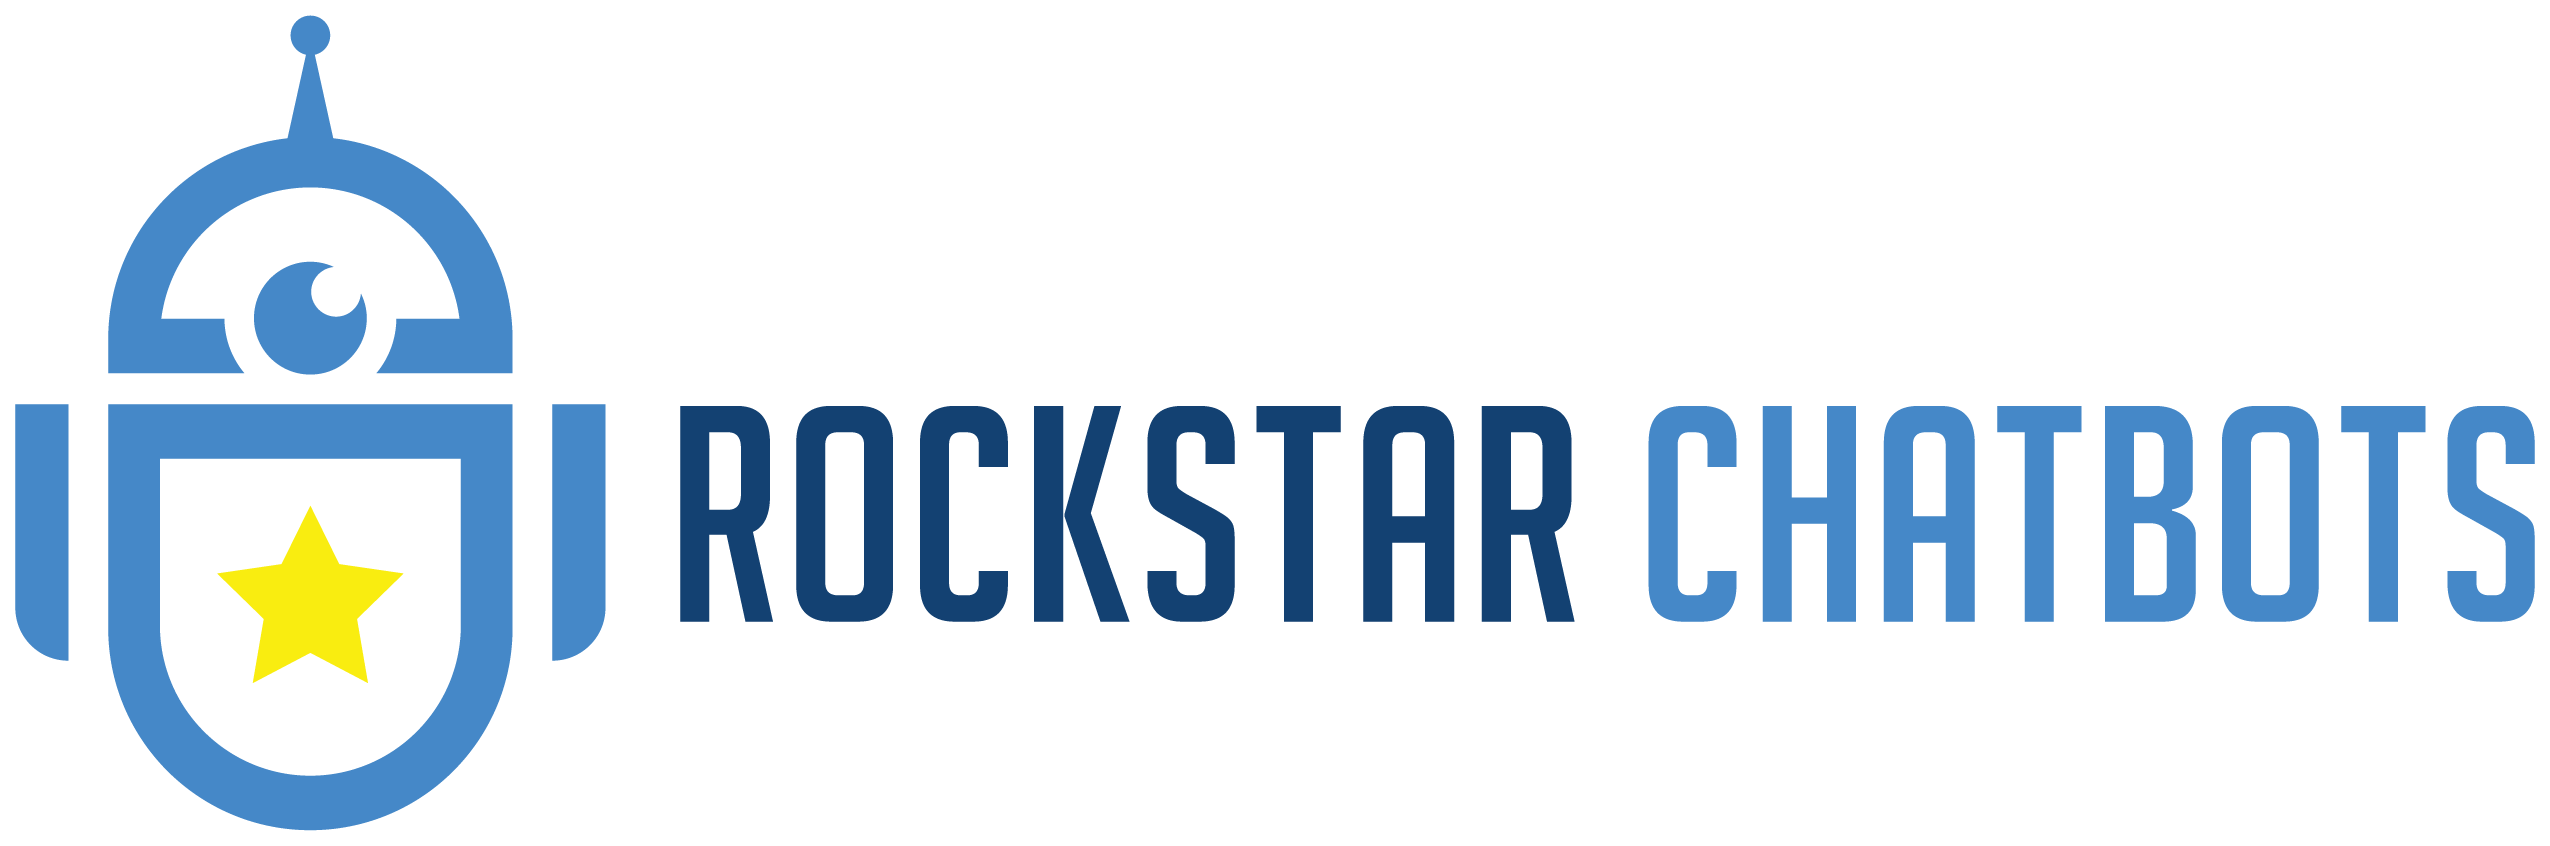 Rockstar ChatBots